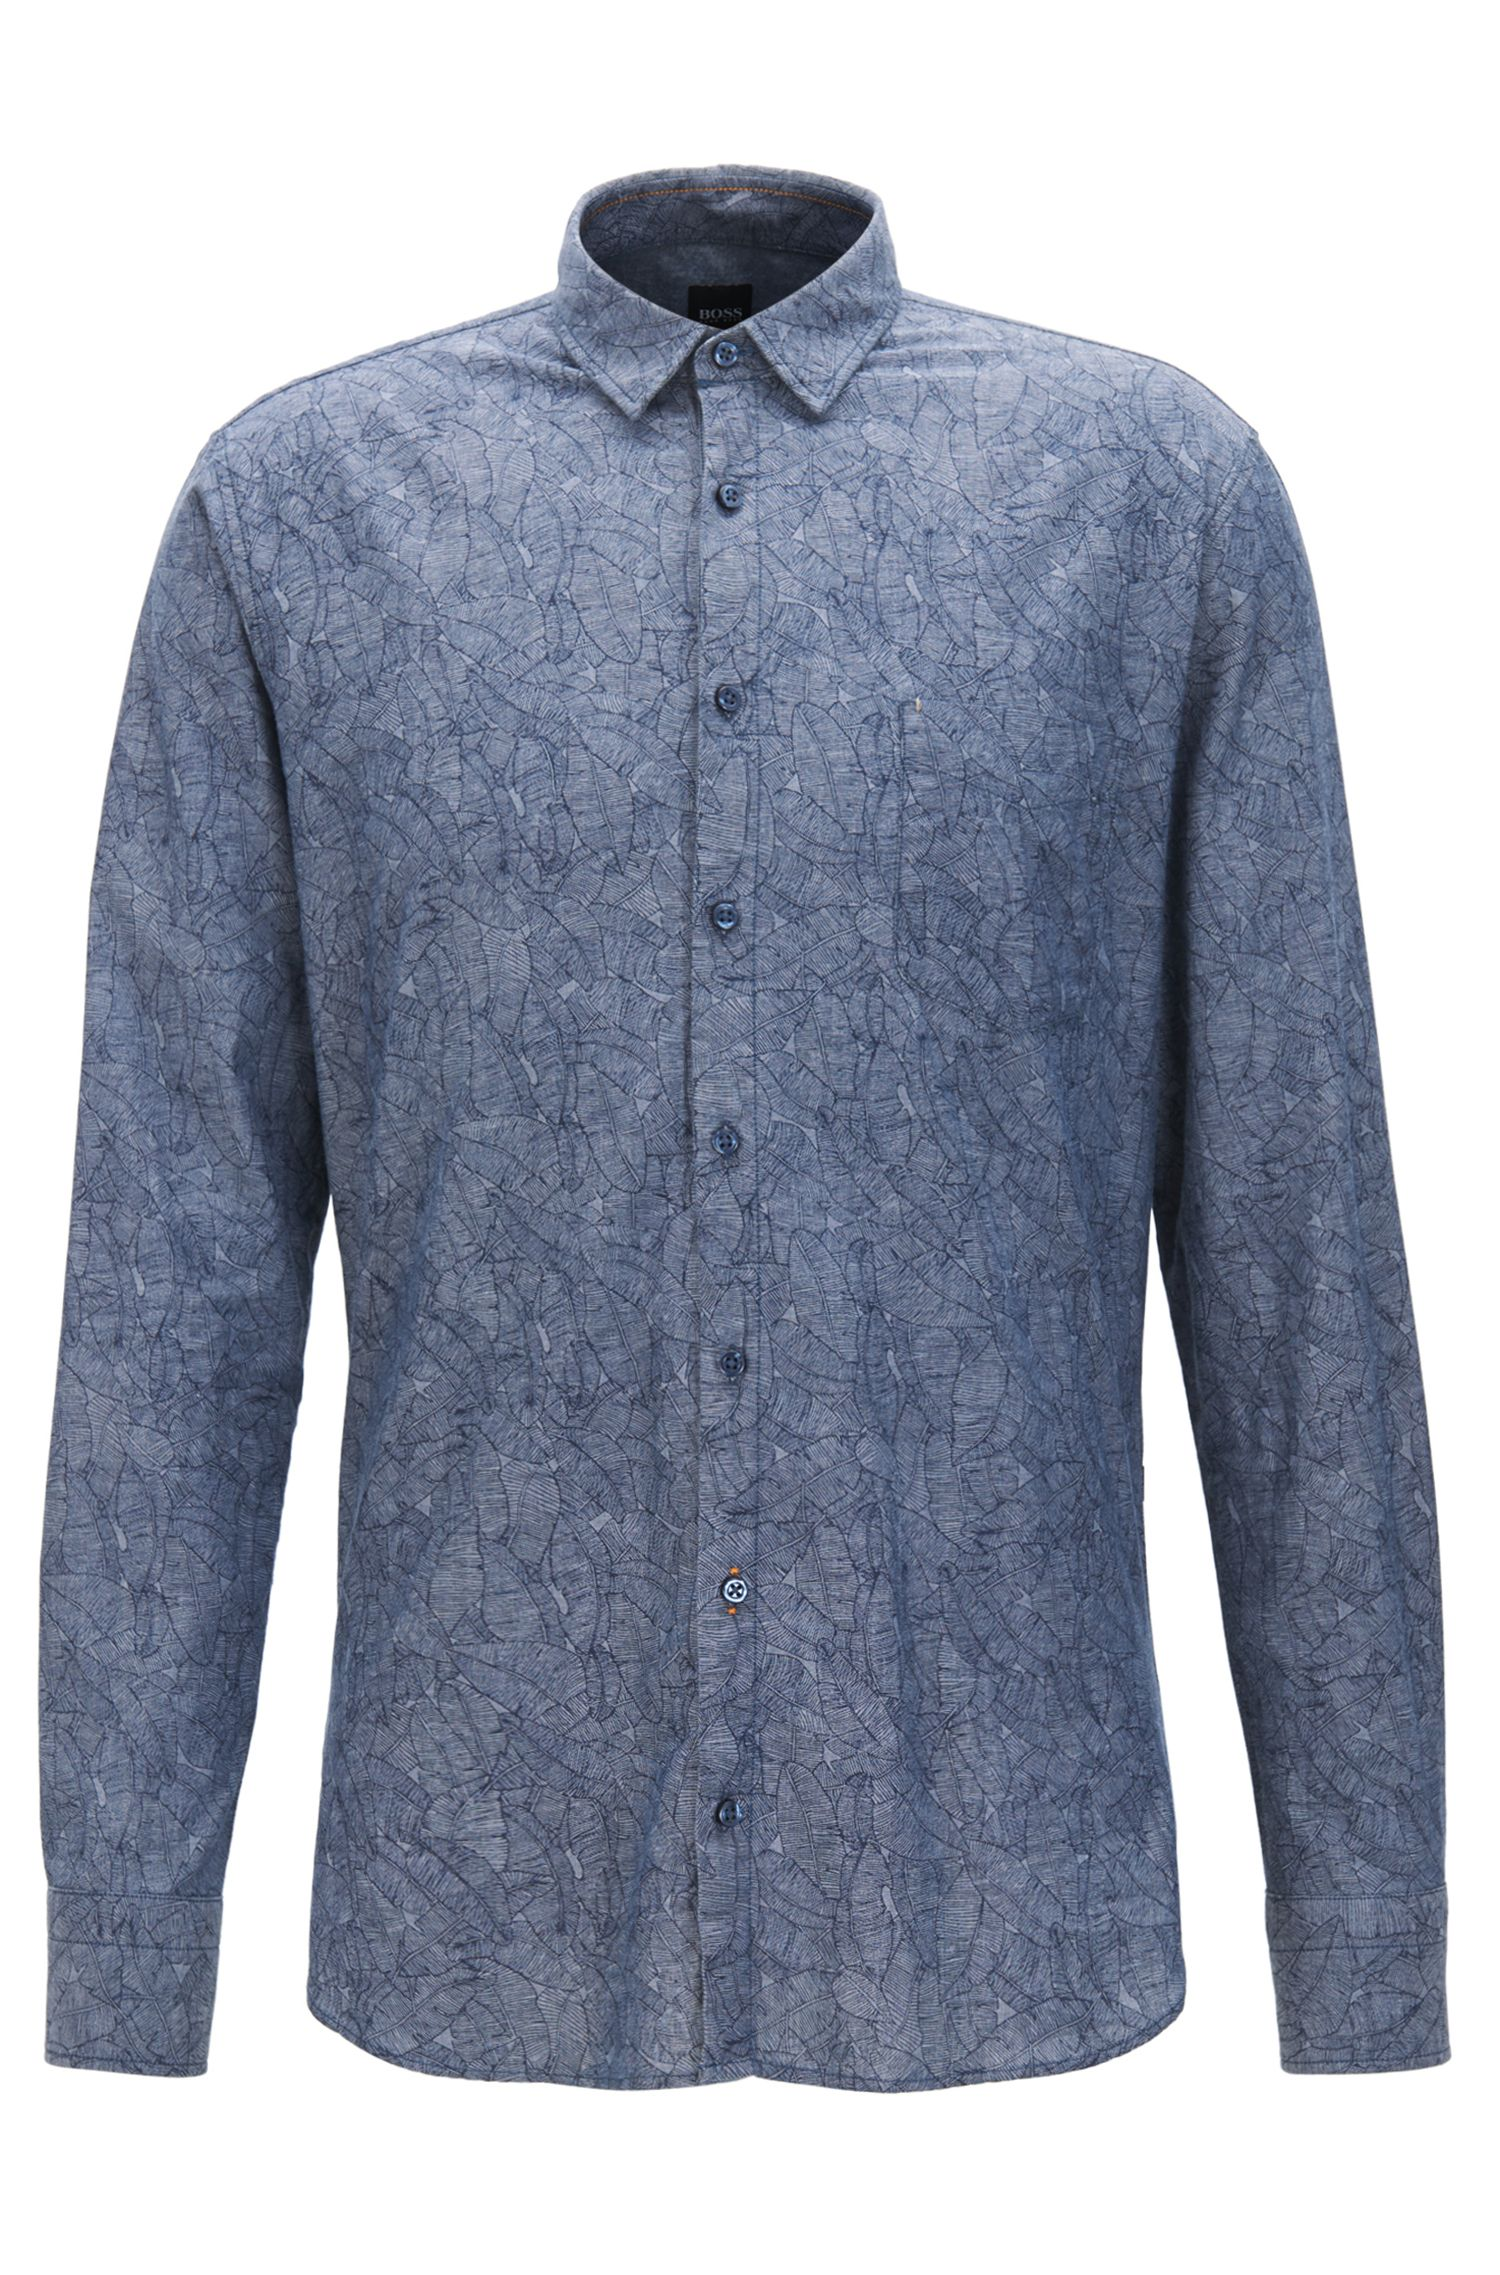 Leaf-Print Chambray Cotton Sport Shirt, Slim Fit | Cattitude